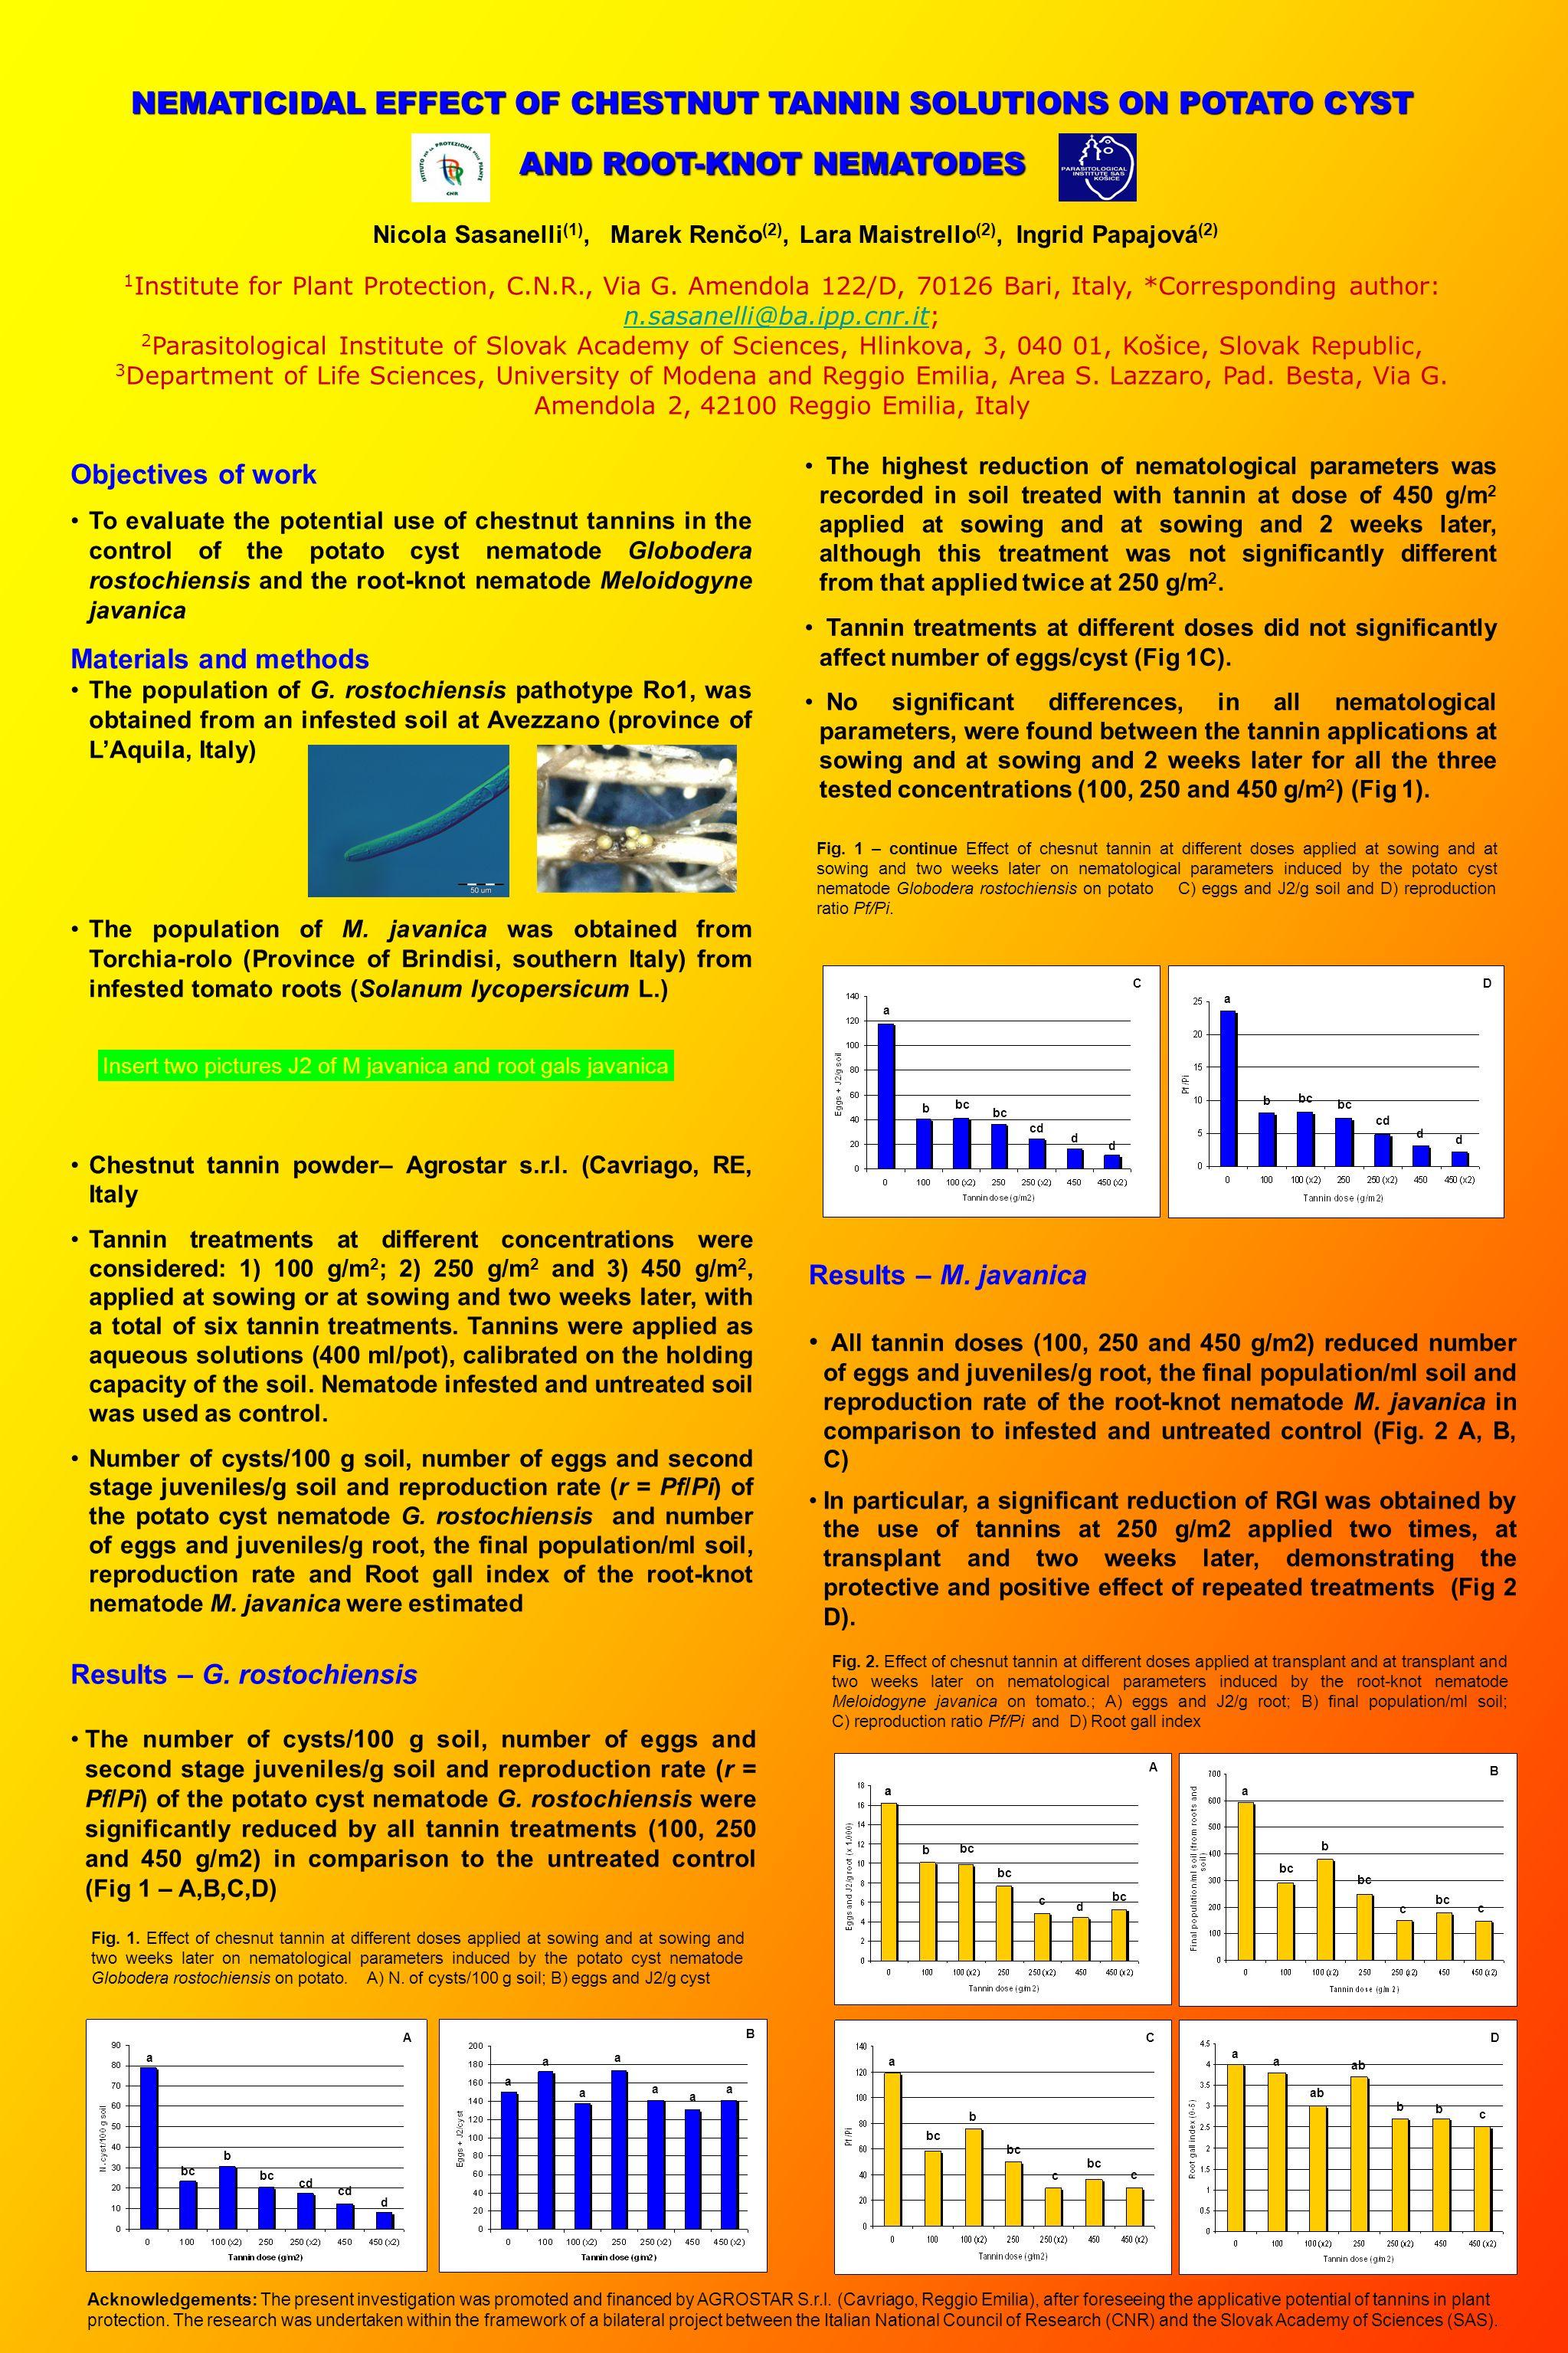 NEMATICIDAL EFFECT OF CHESTNUT TANNIN SOLUTIONS ON POTATO CYST AND ROOT-KNOT NEMATODES Nicola Sasanelli (1), Marek Renčo (2), Lara Maistrello (2), Ing